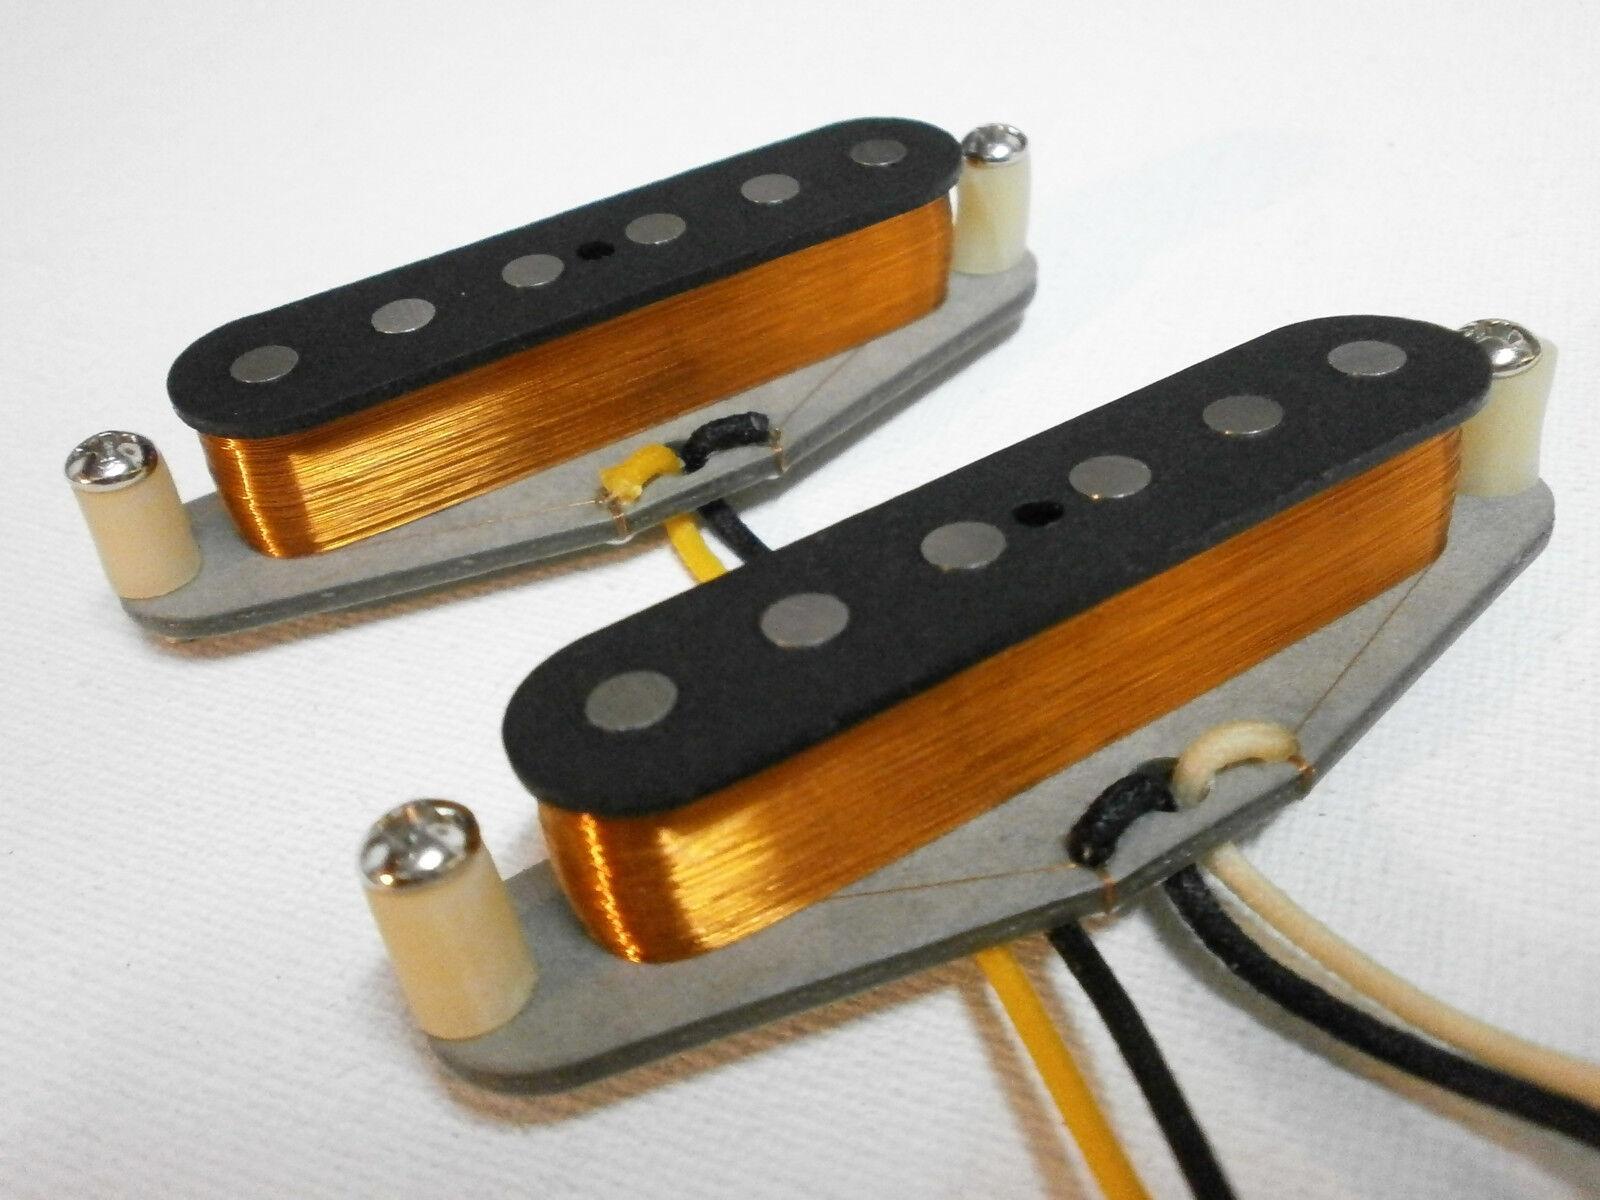 Mustang Guitarra De colección colección colección Conjunto de recogida correcto de 1964 A5 Fender Duosonic mano herida Q 02075e